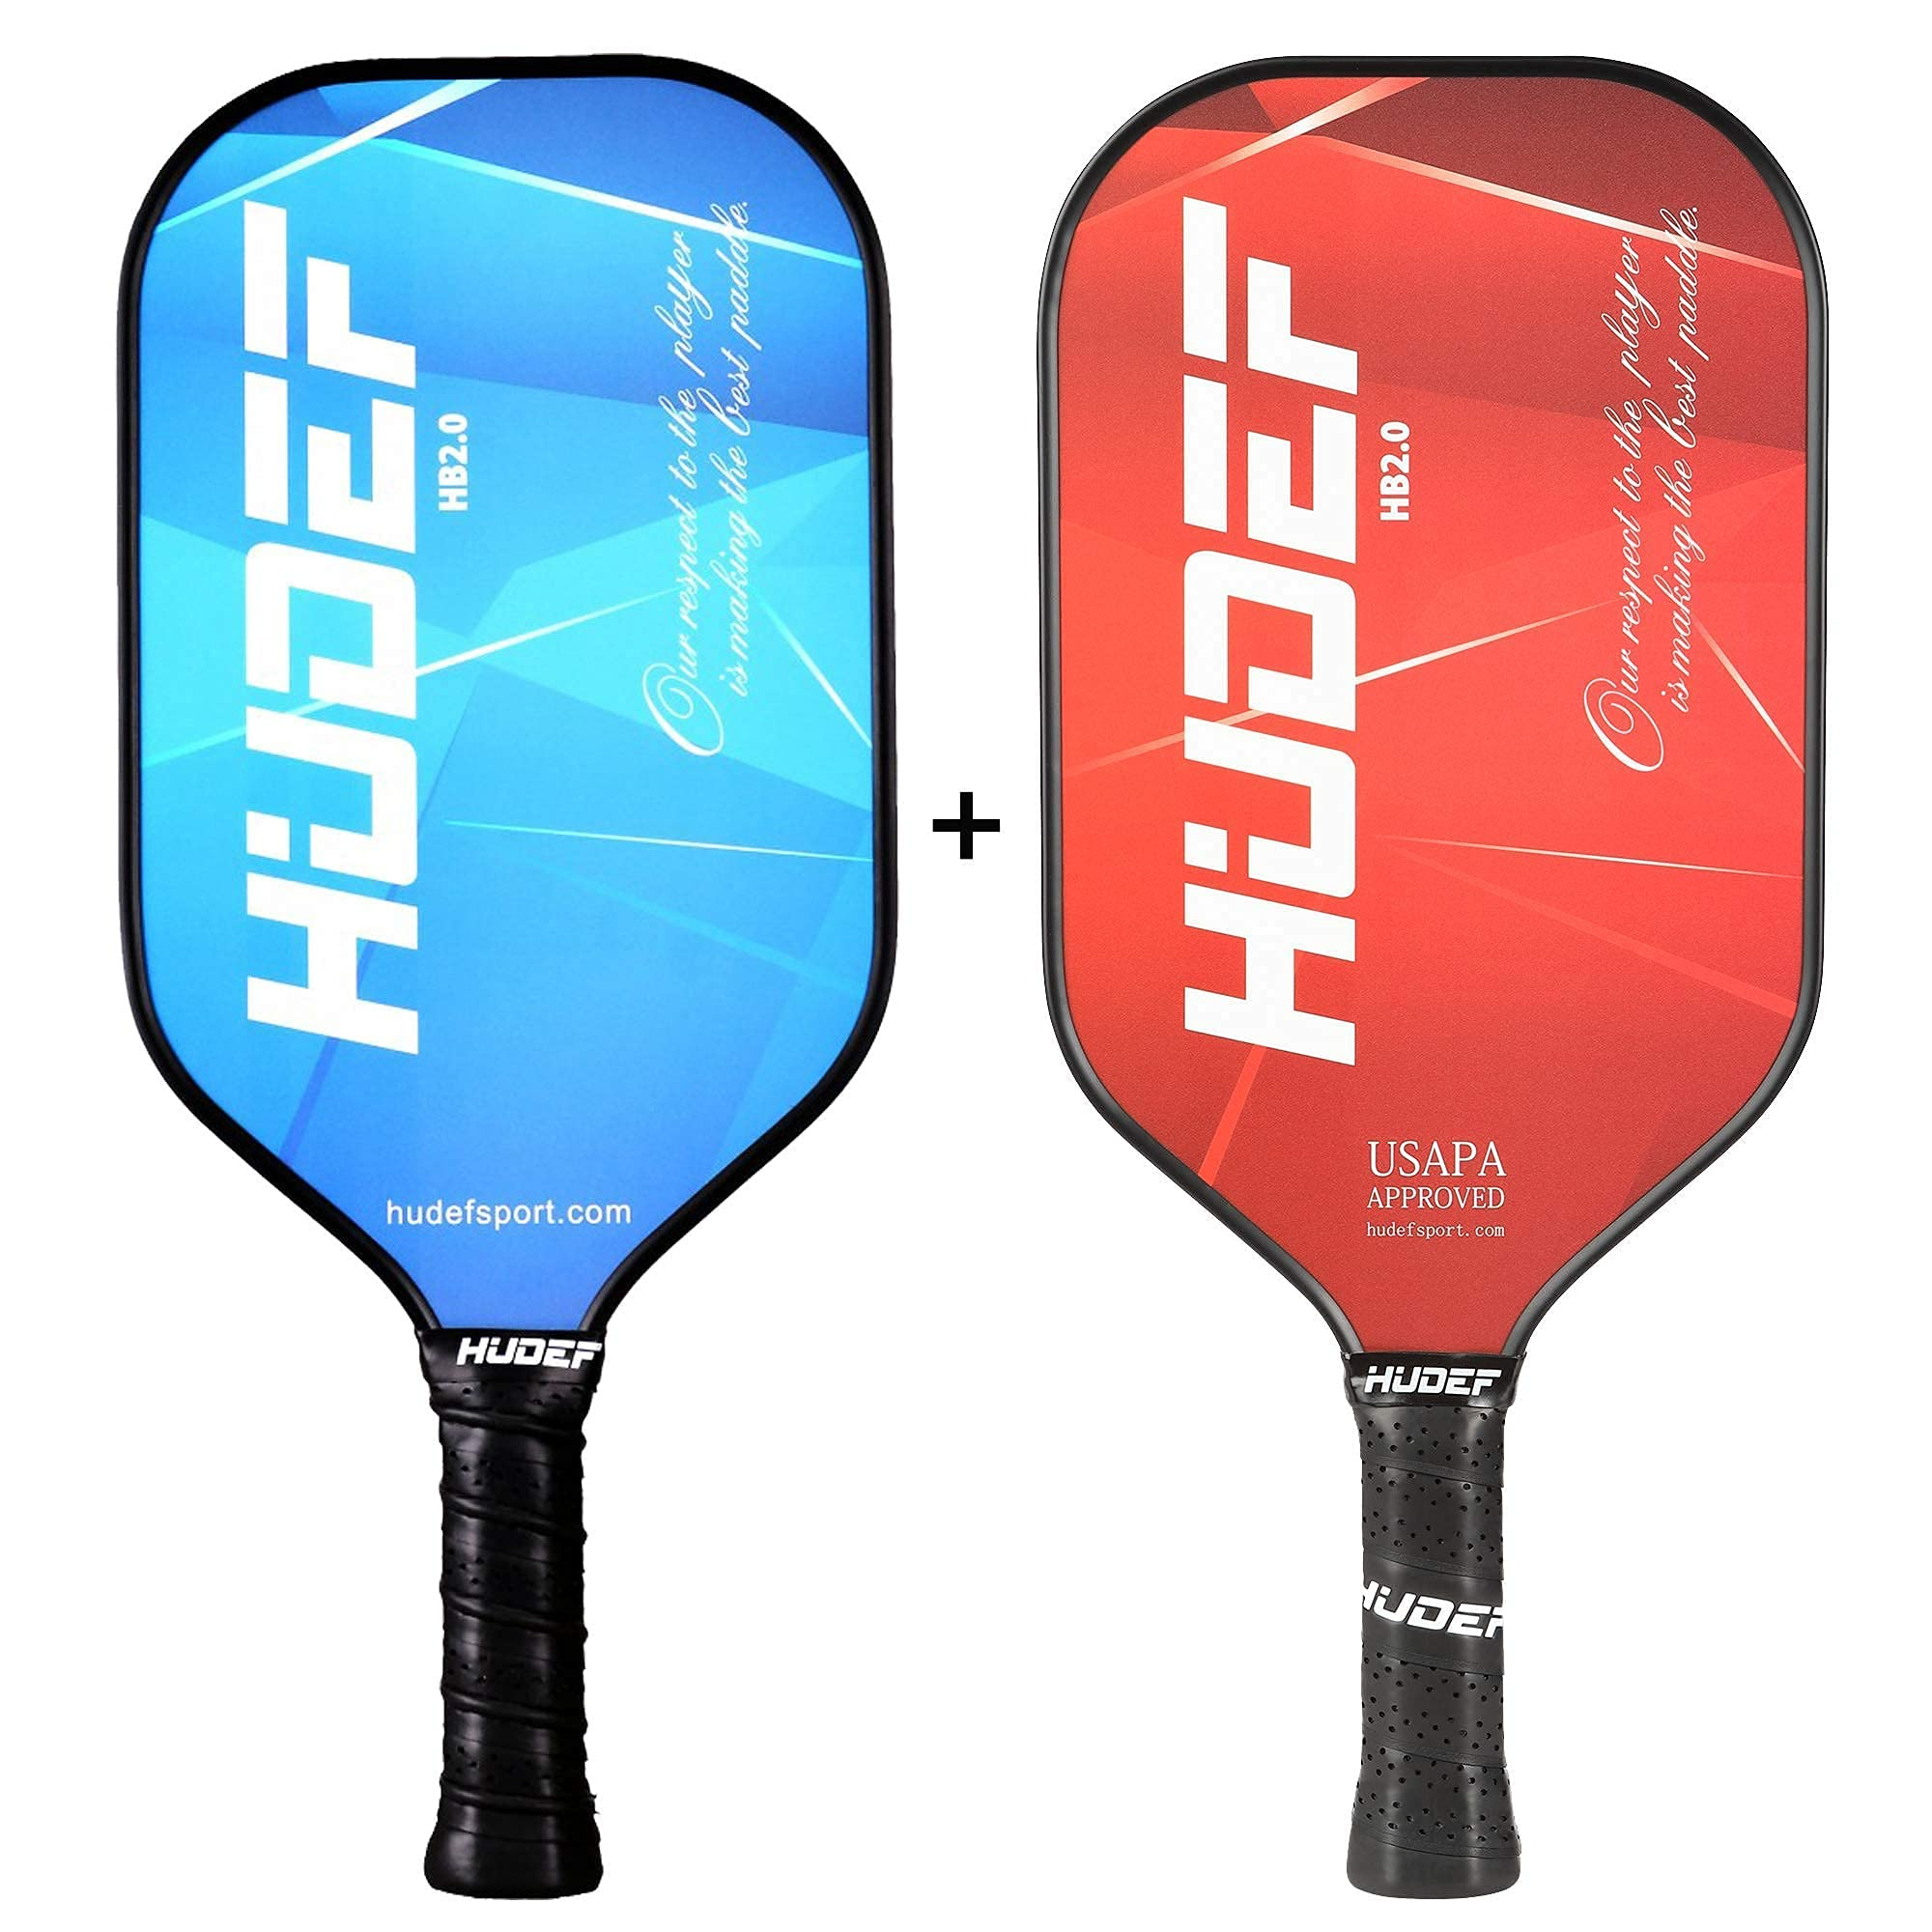 HUDEF HB 2.0 Blue+Red Pickleball Paddles Lightweight Graphit